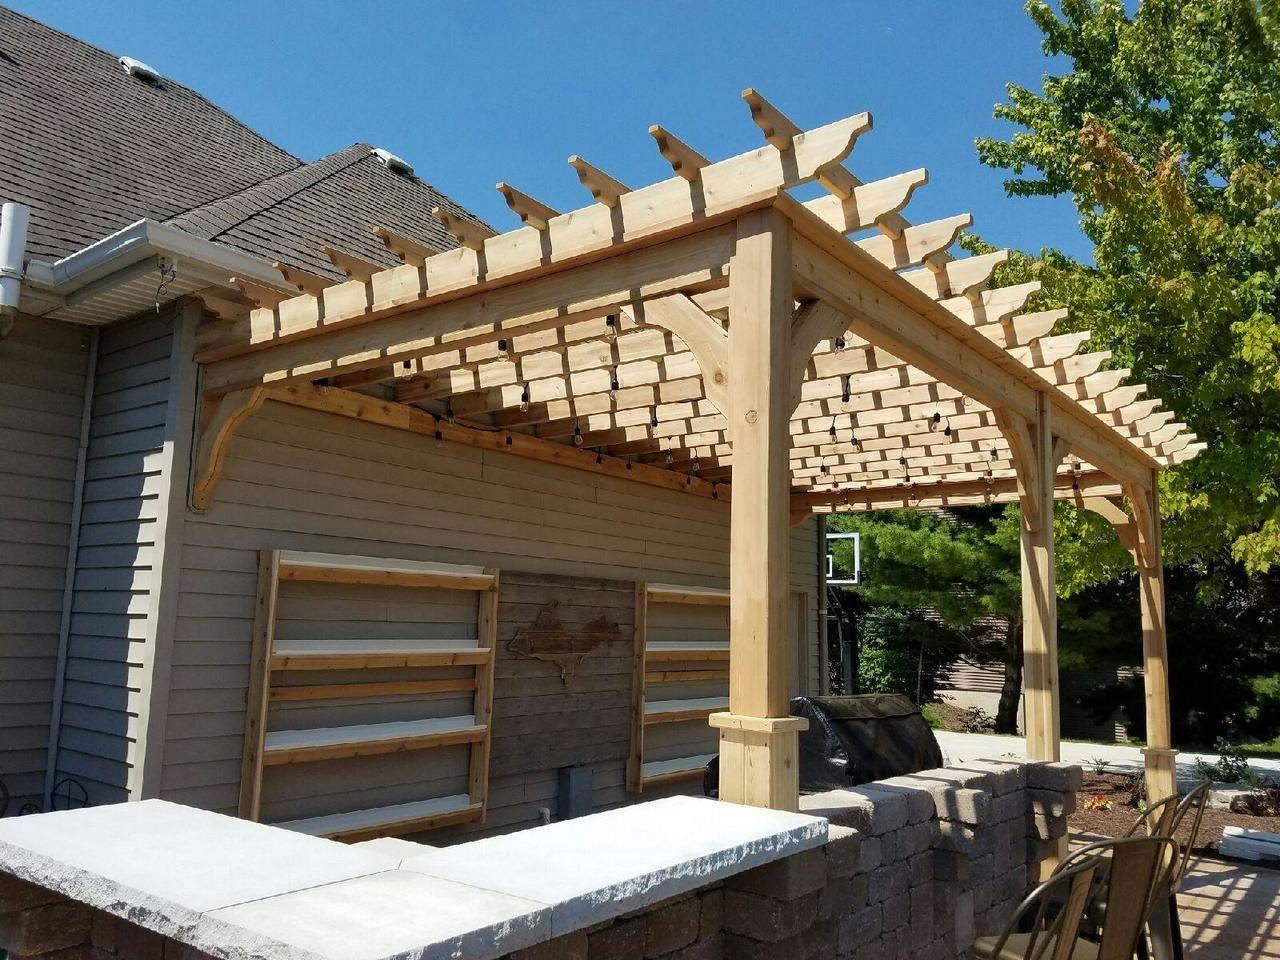 Serenity Cedar Pergola Kit Wall Mounted In 2019 Wooden